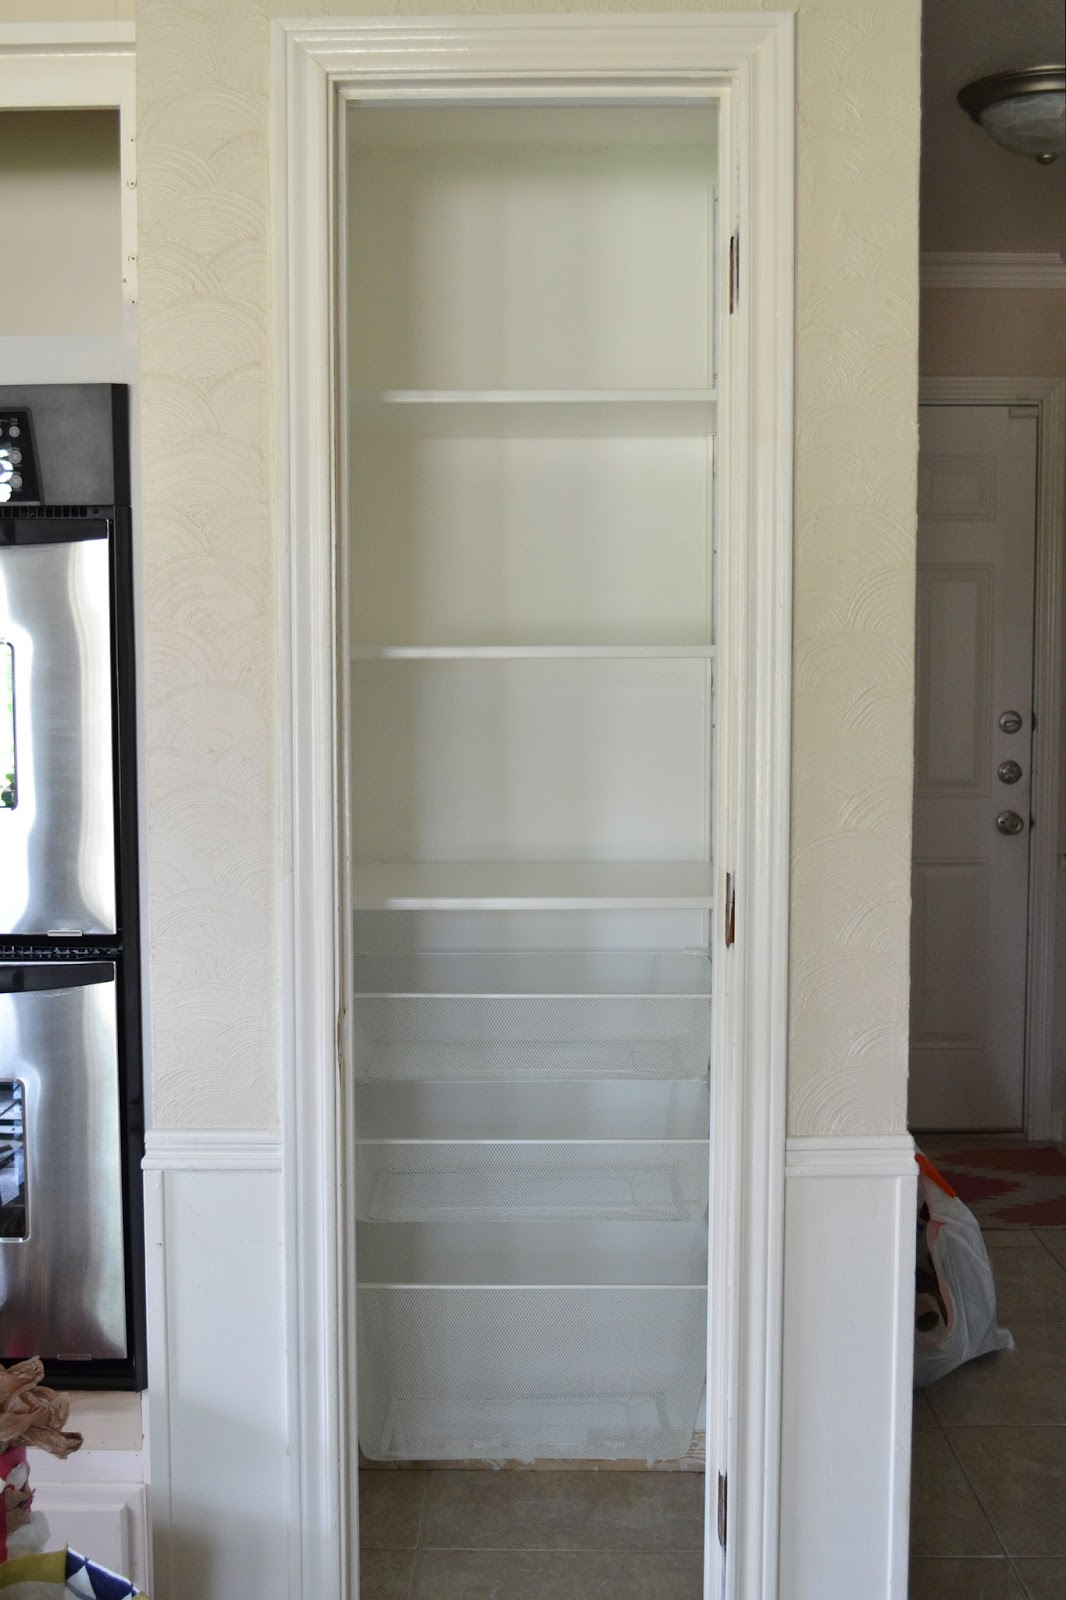 pantry-organization-ikea-algot-system-1.jpg